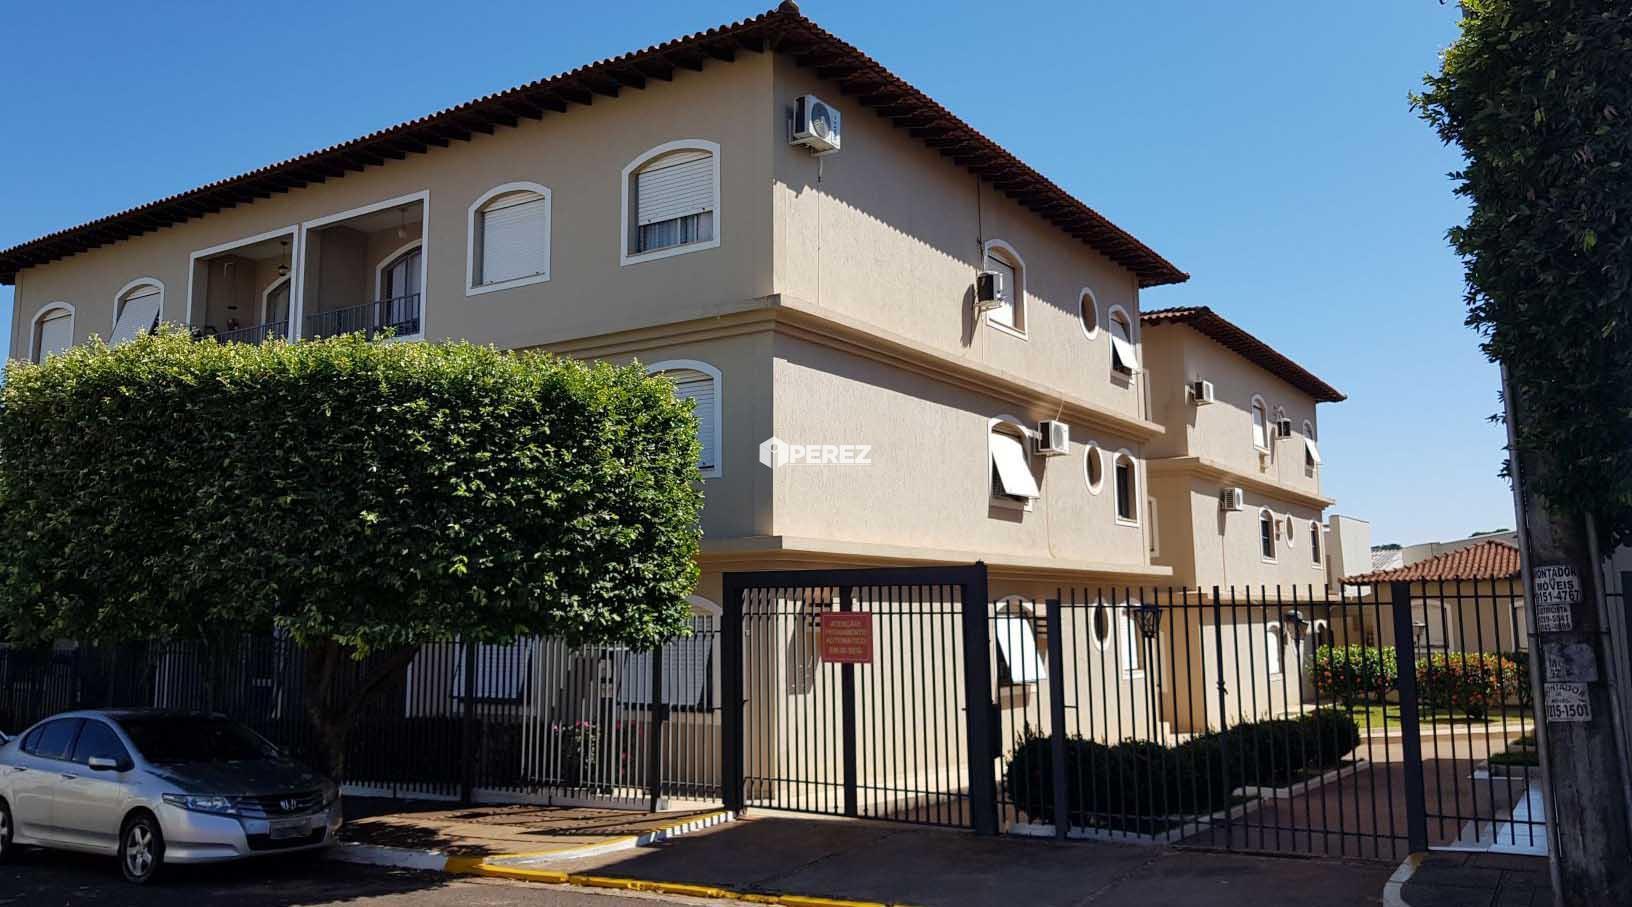 venda-campo-grande-ms-apartamento-goncalves-dias-jardim-monte-libano-perez-imoveis